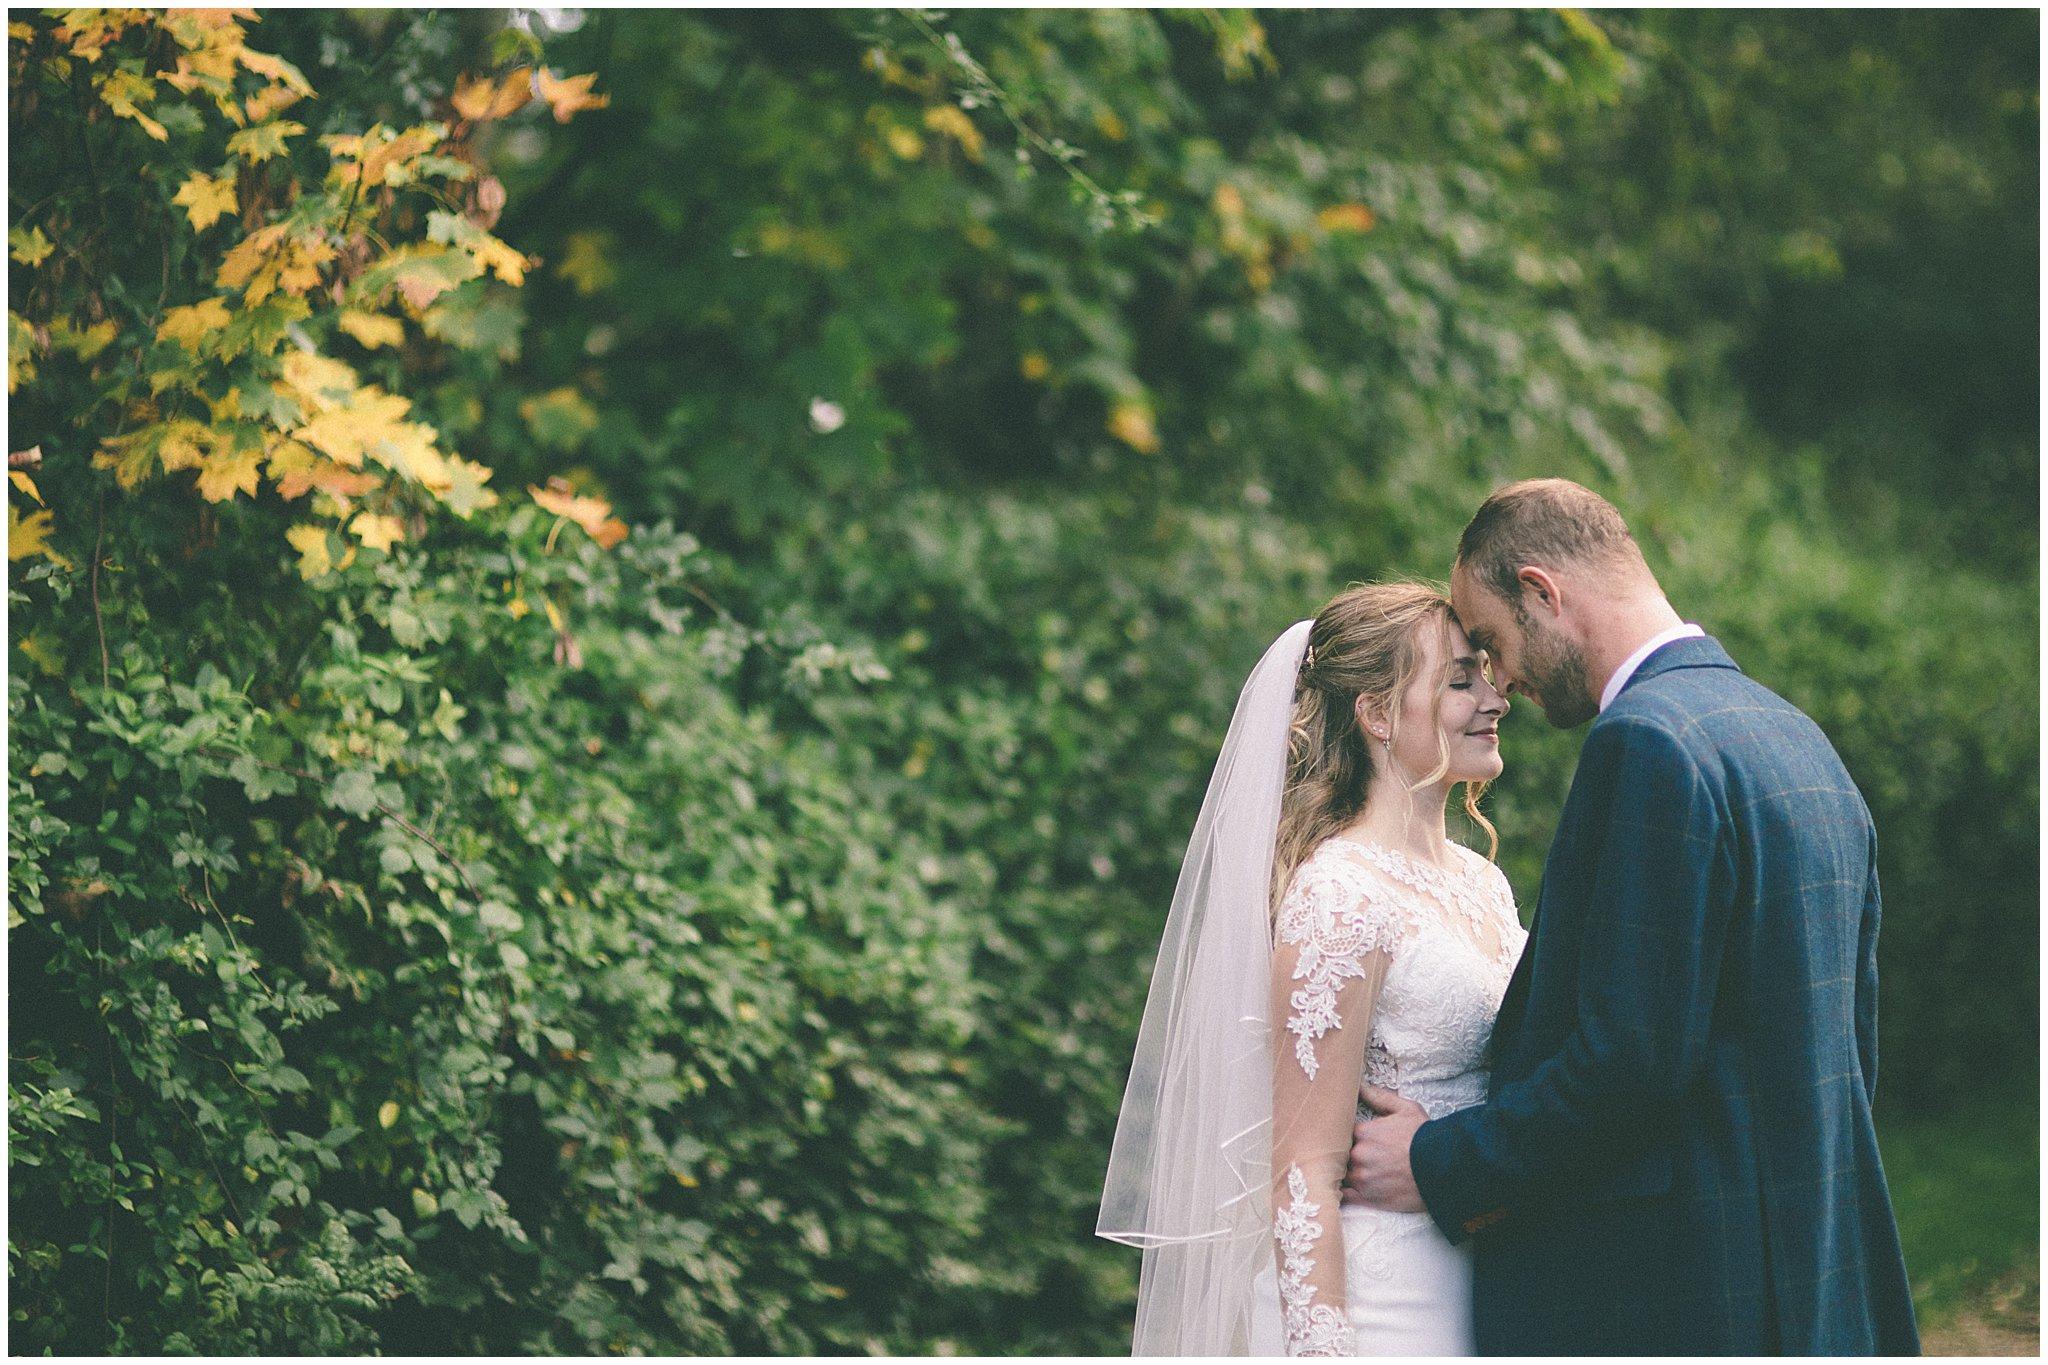 Brockenhurst wedding photography